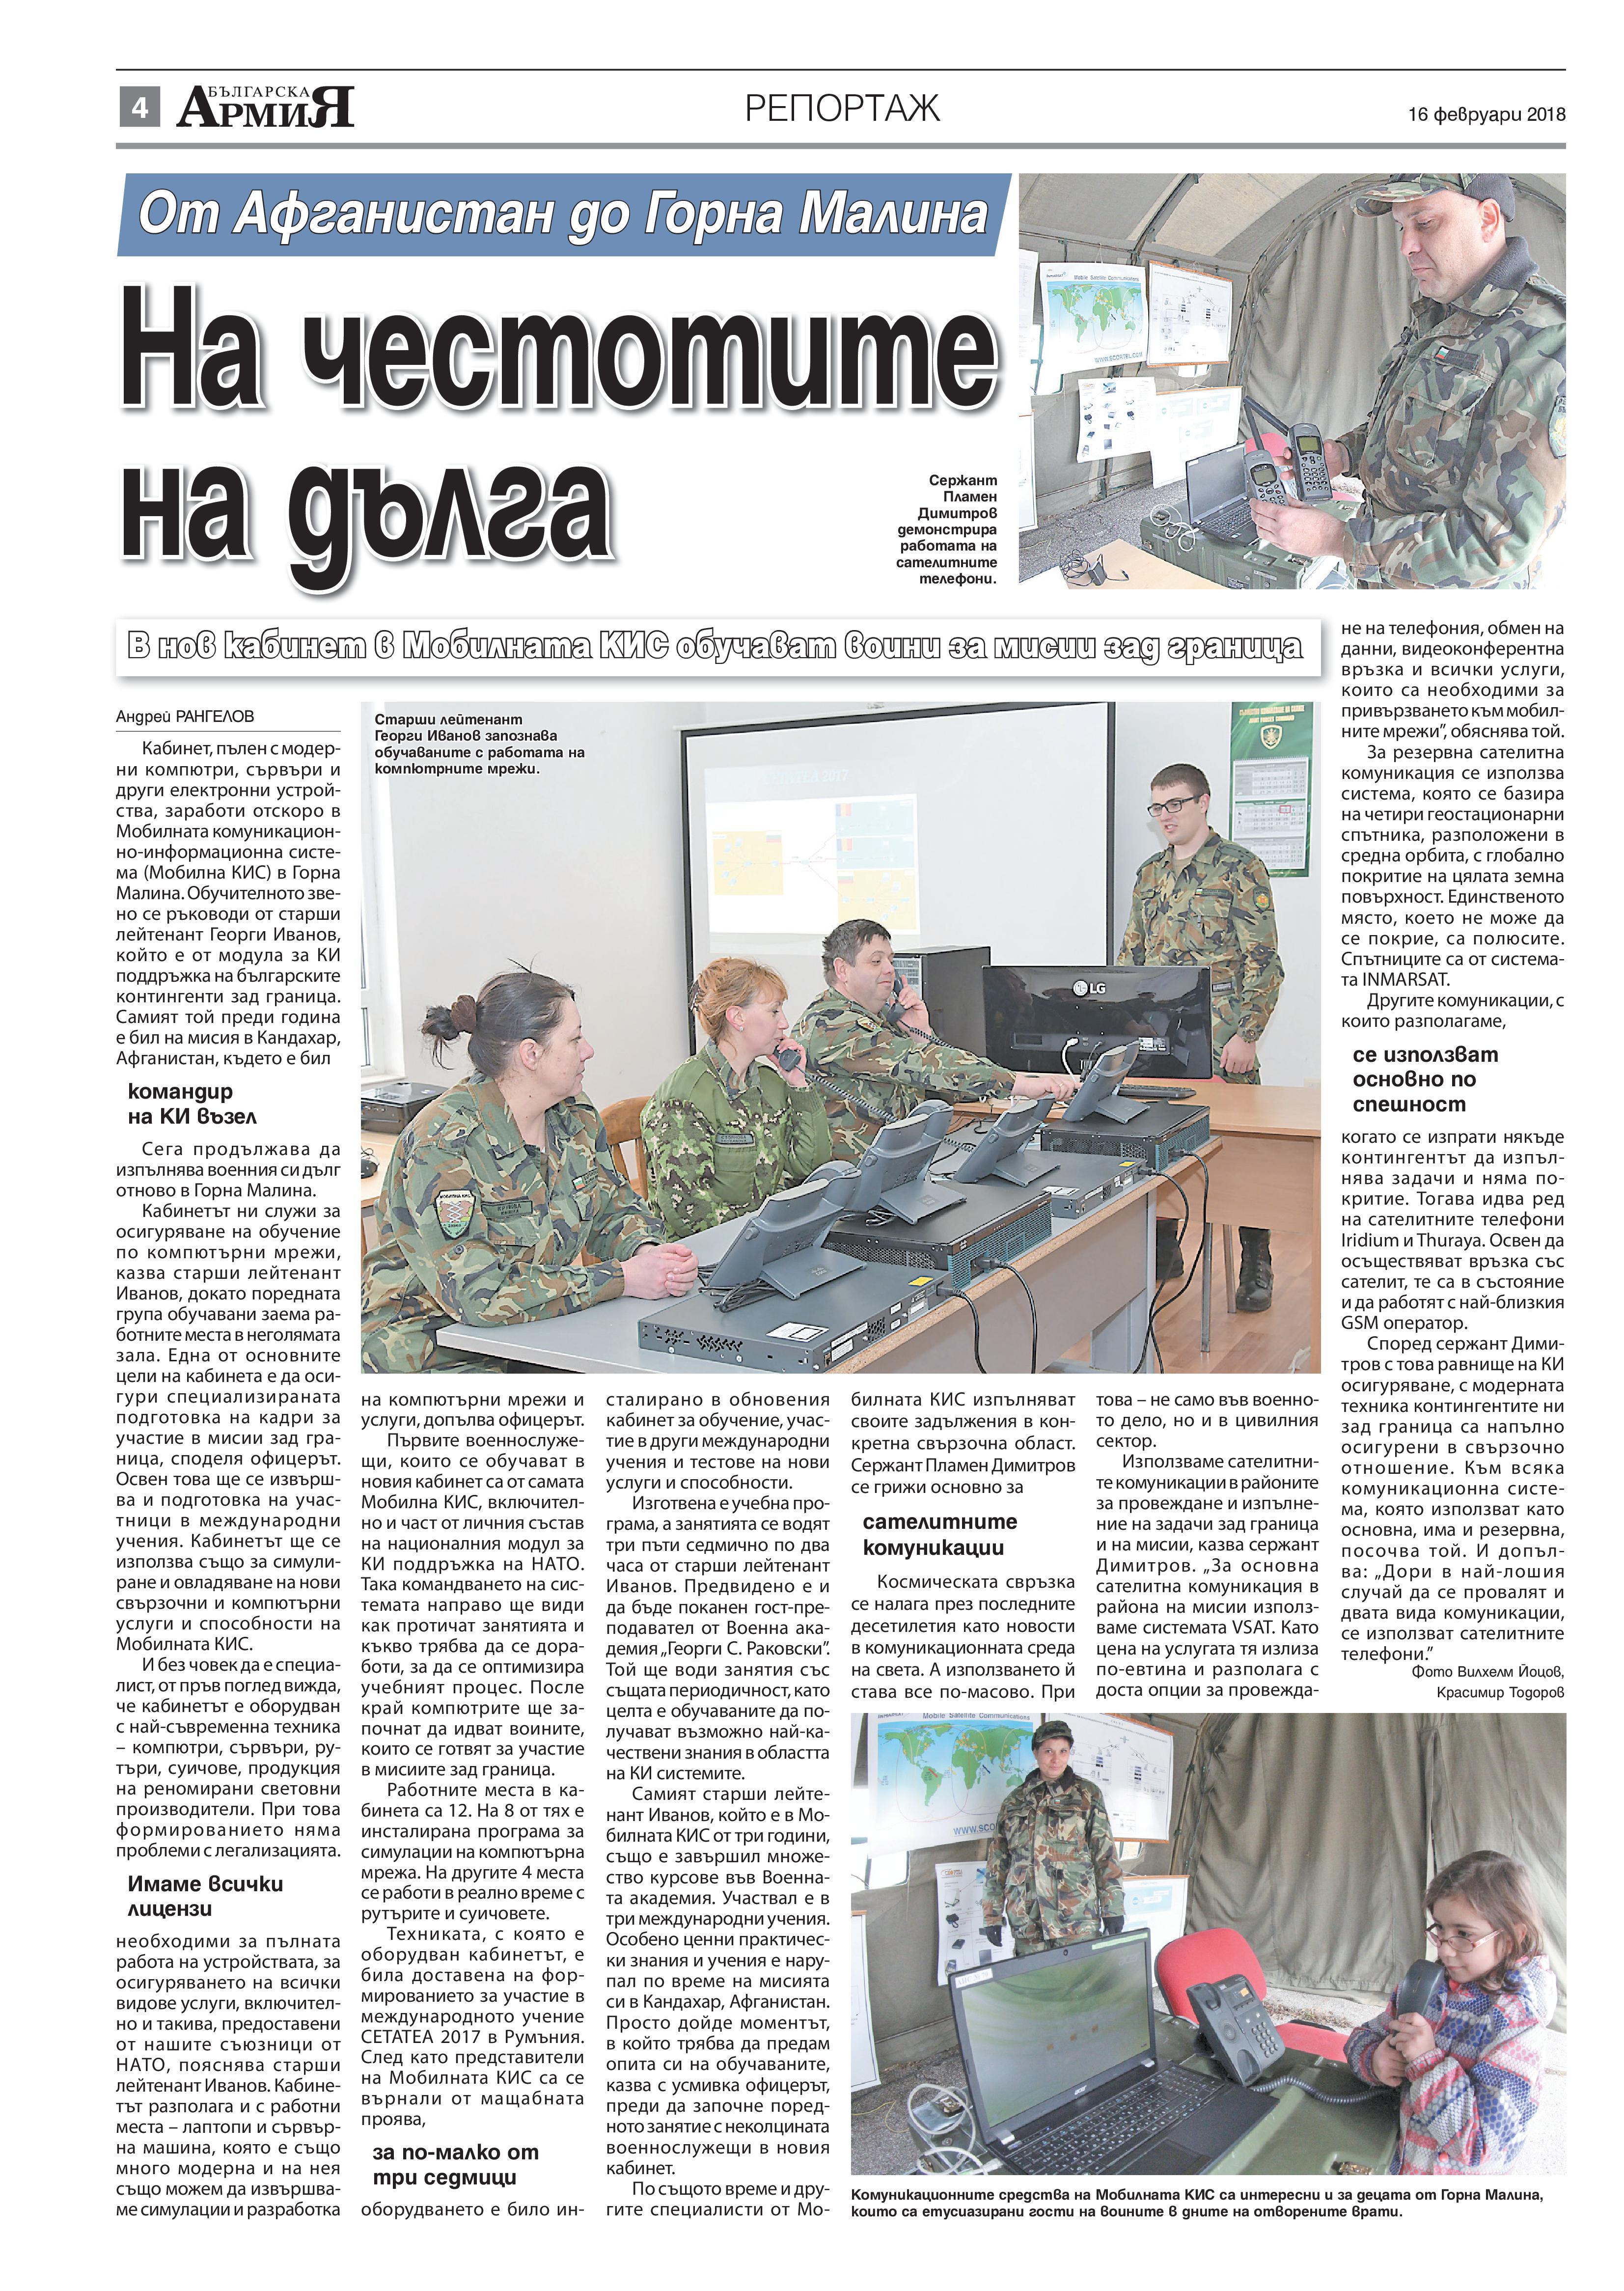 http://armymedia.bg/wp-content/uploads/2015/06/04-19.jpg